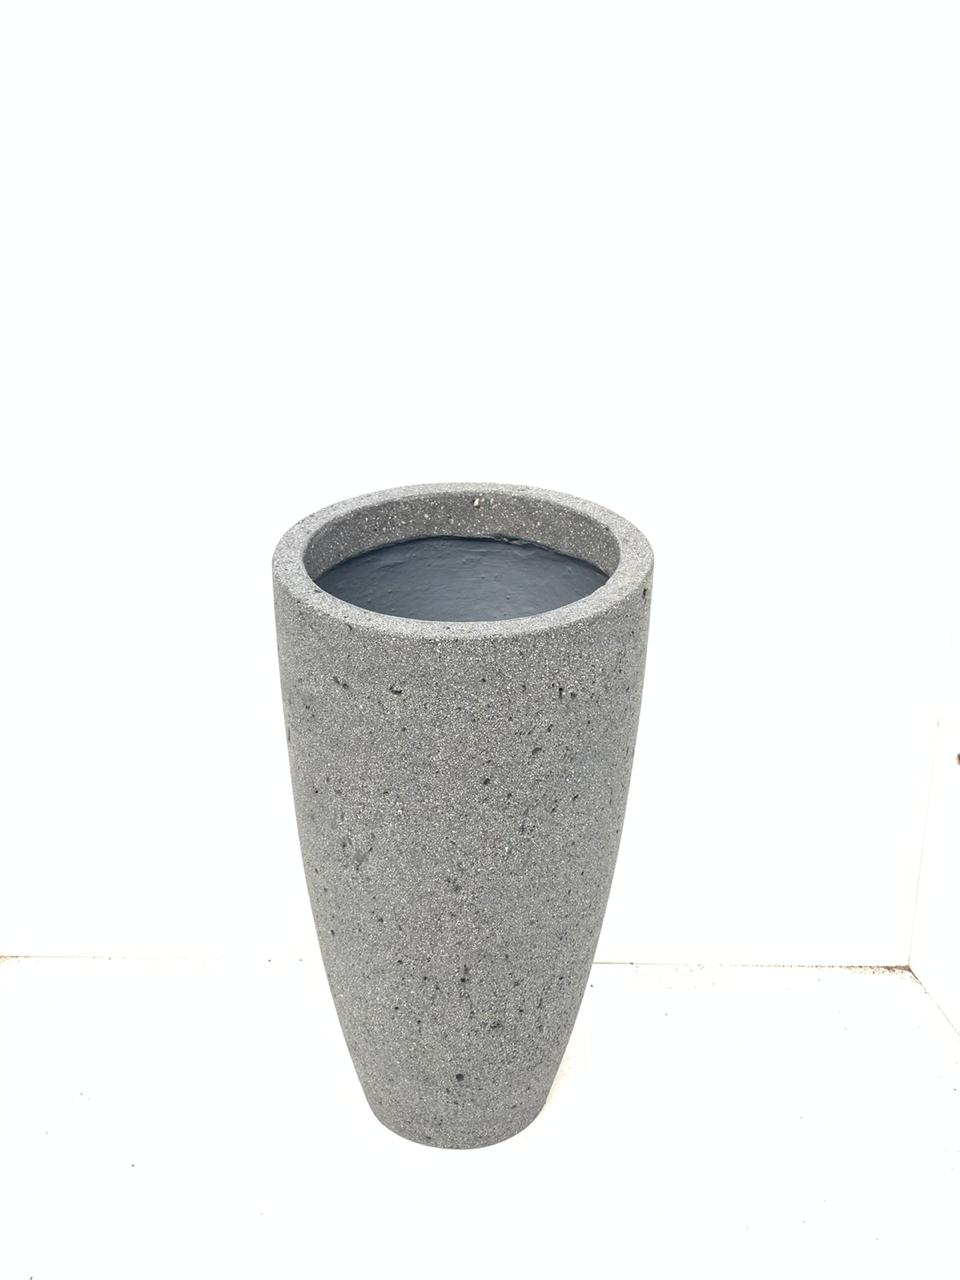 Round Ficonstone Hurricane Light & Oil Lamp 'Pots & Vases Ficonstone